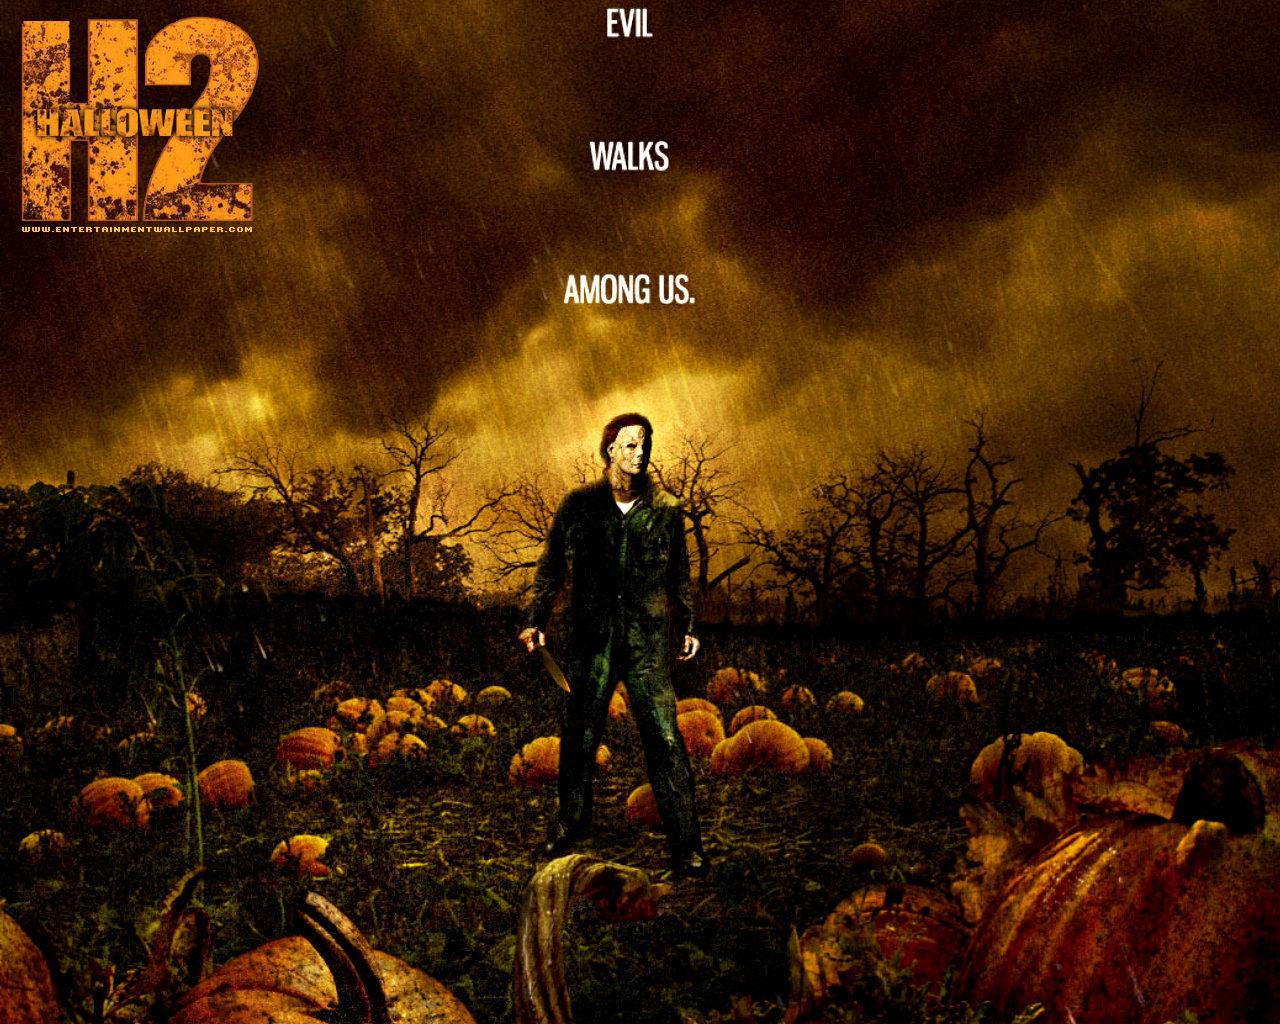 download Halloween 2 images Halloween 2 HD wallpaper and 1280x1024